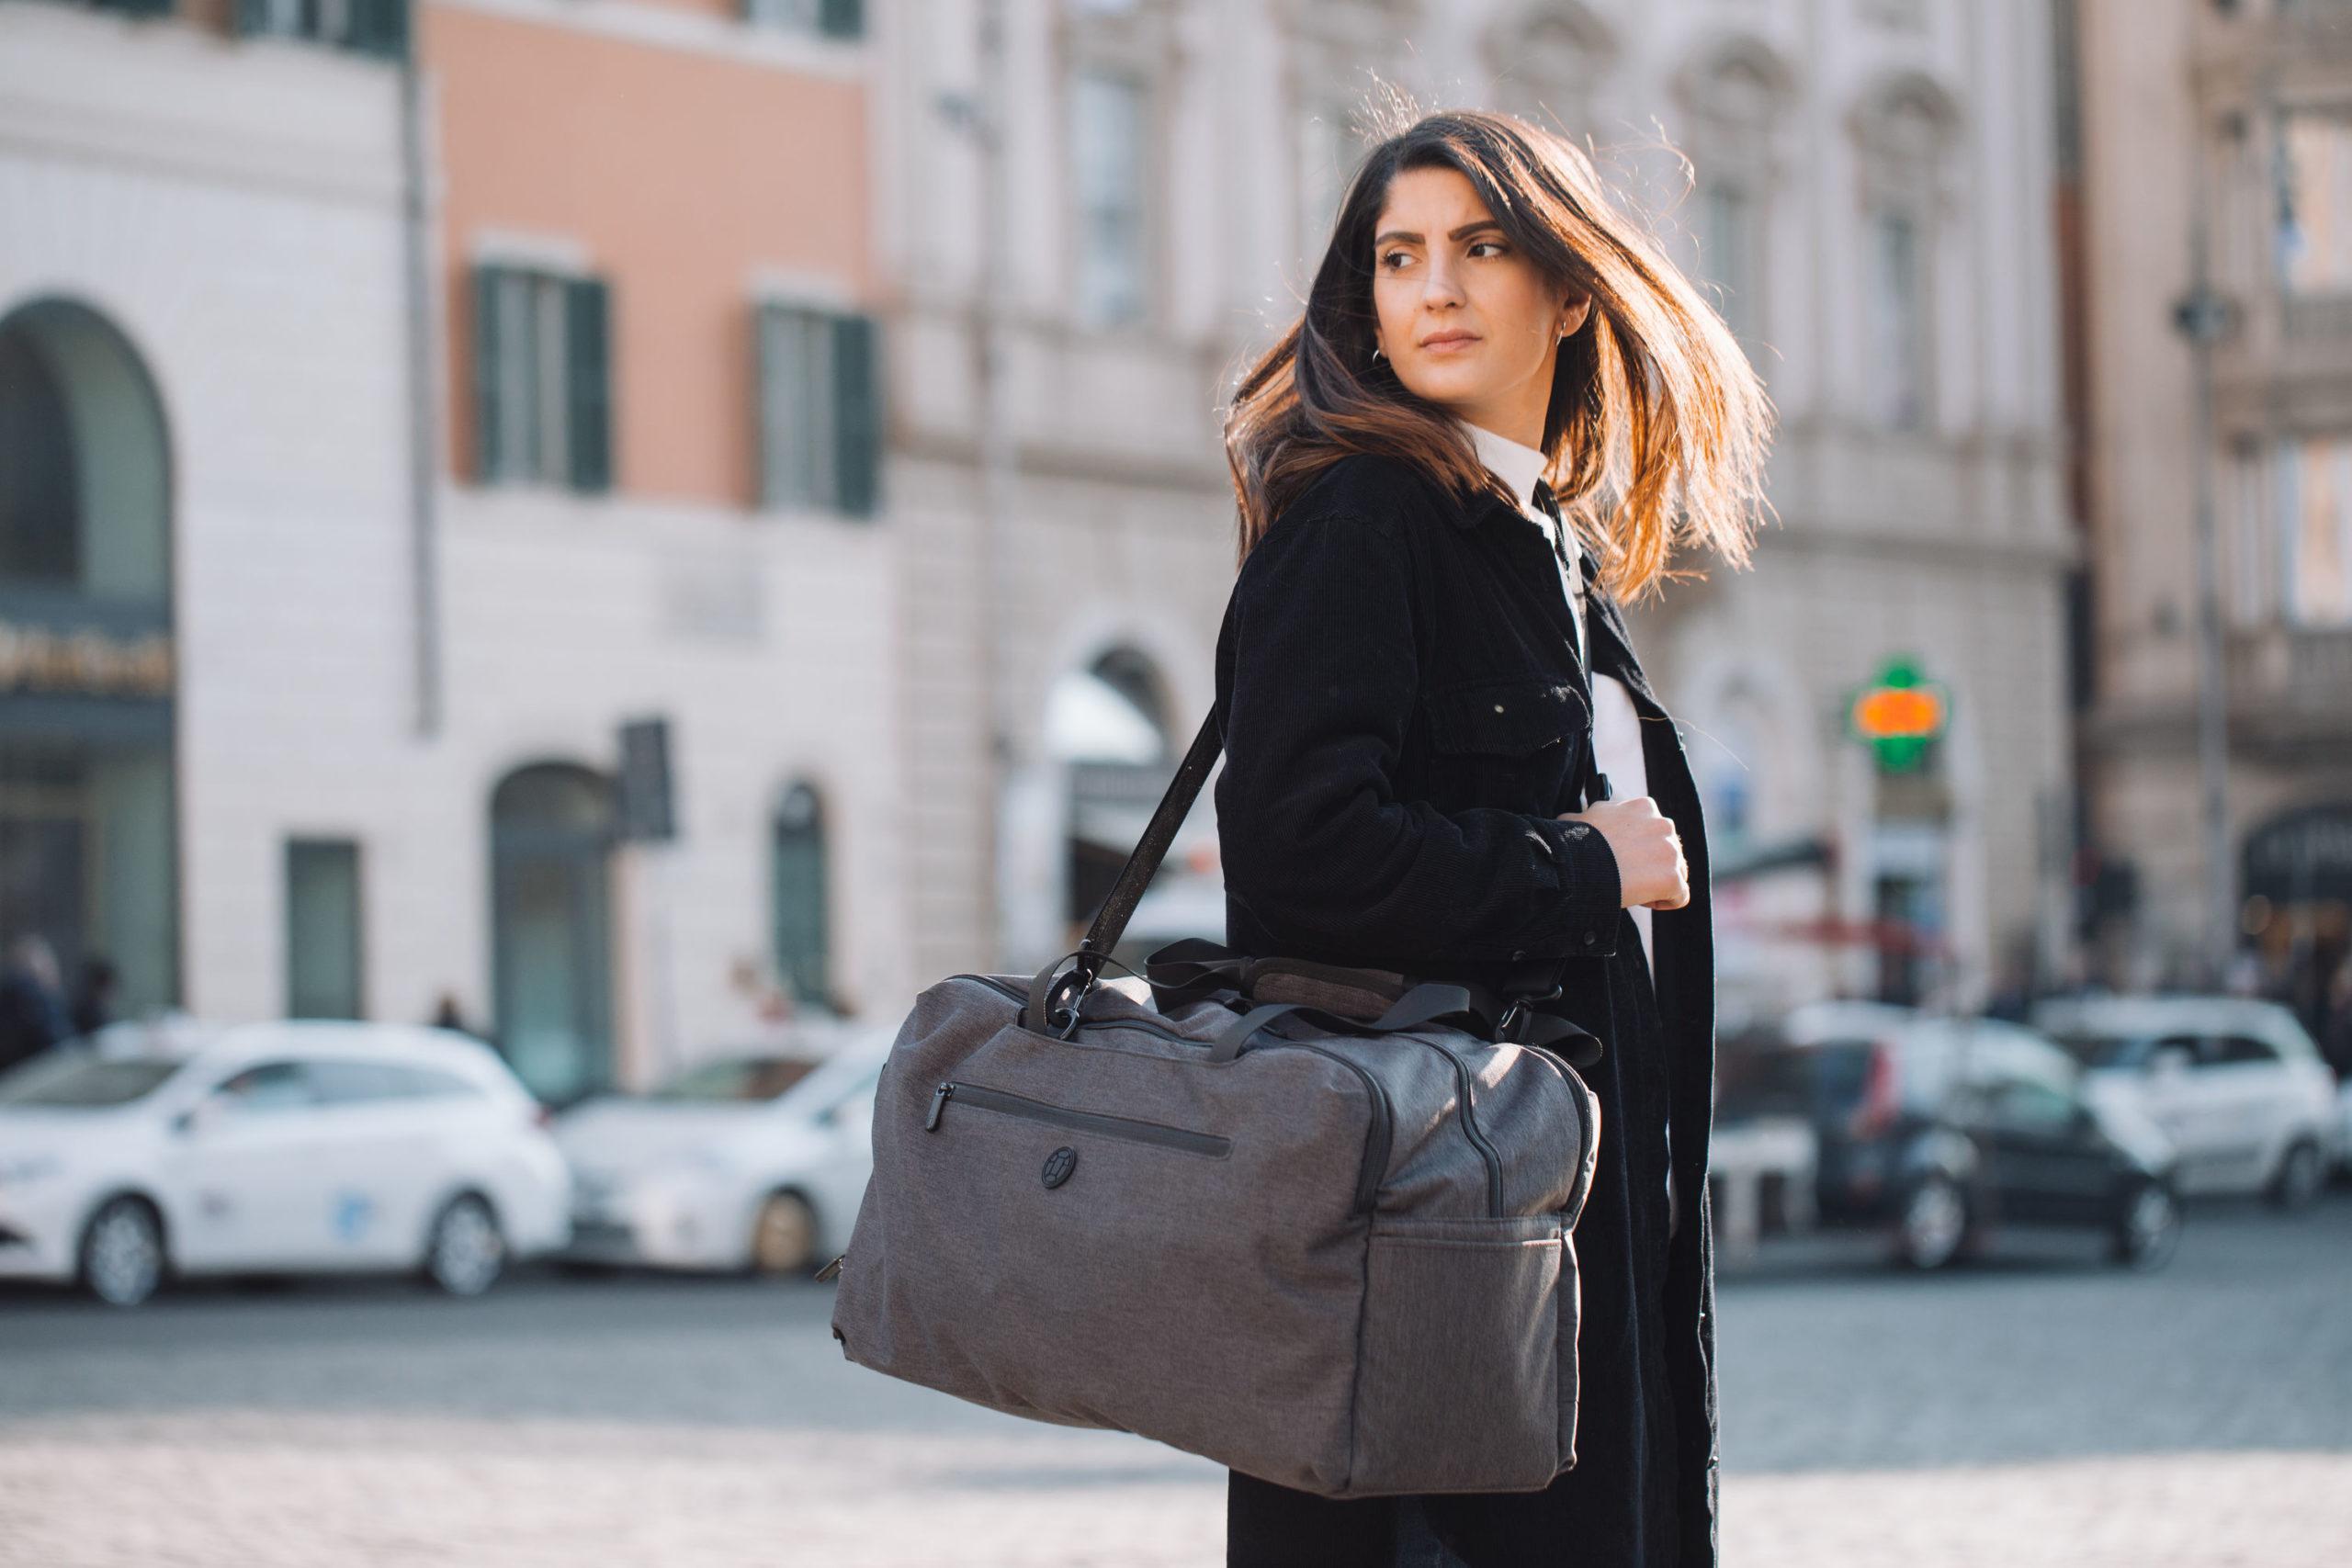 Woman carrying duffle bag in Rome